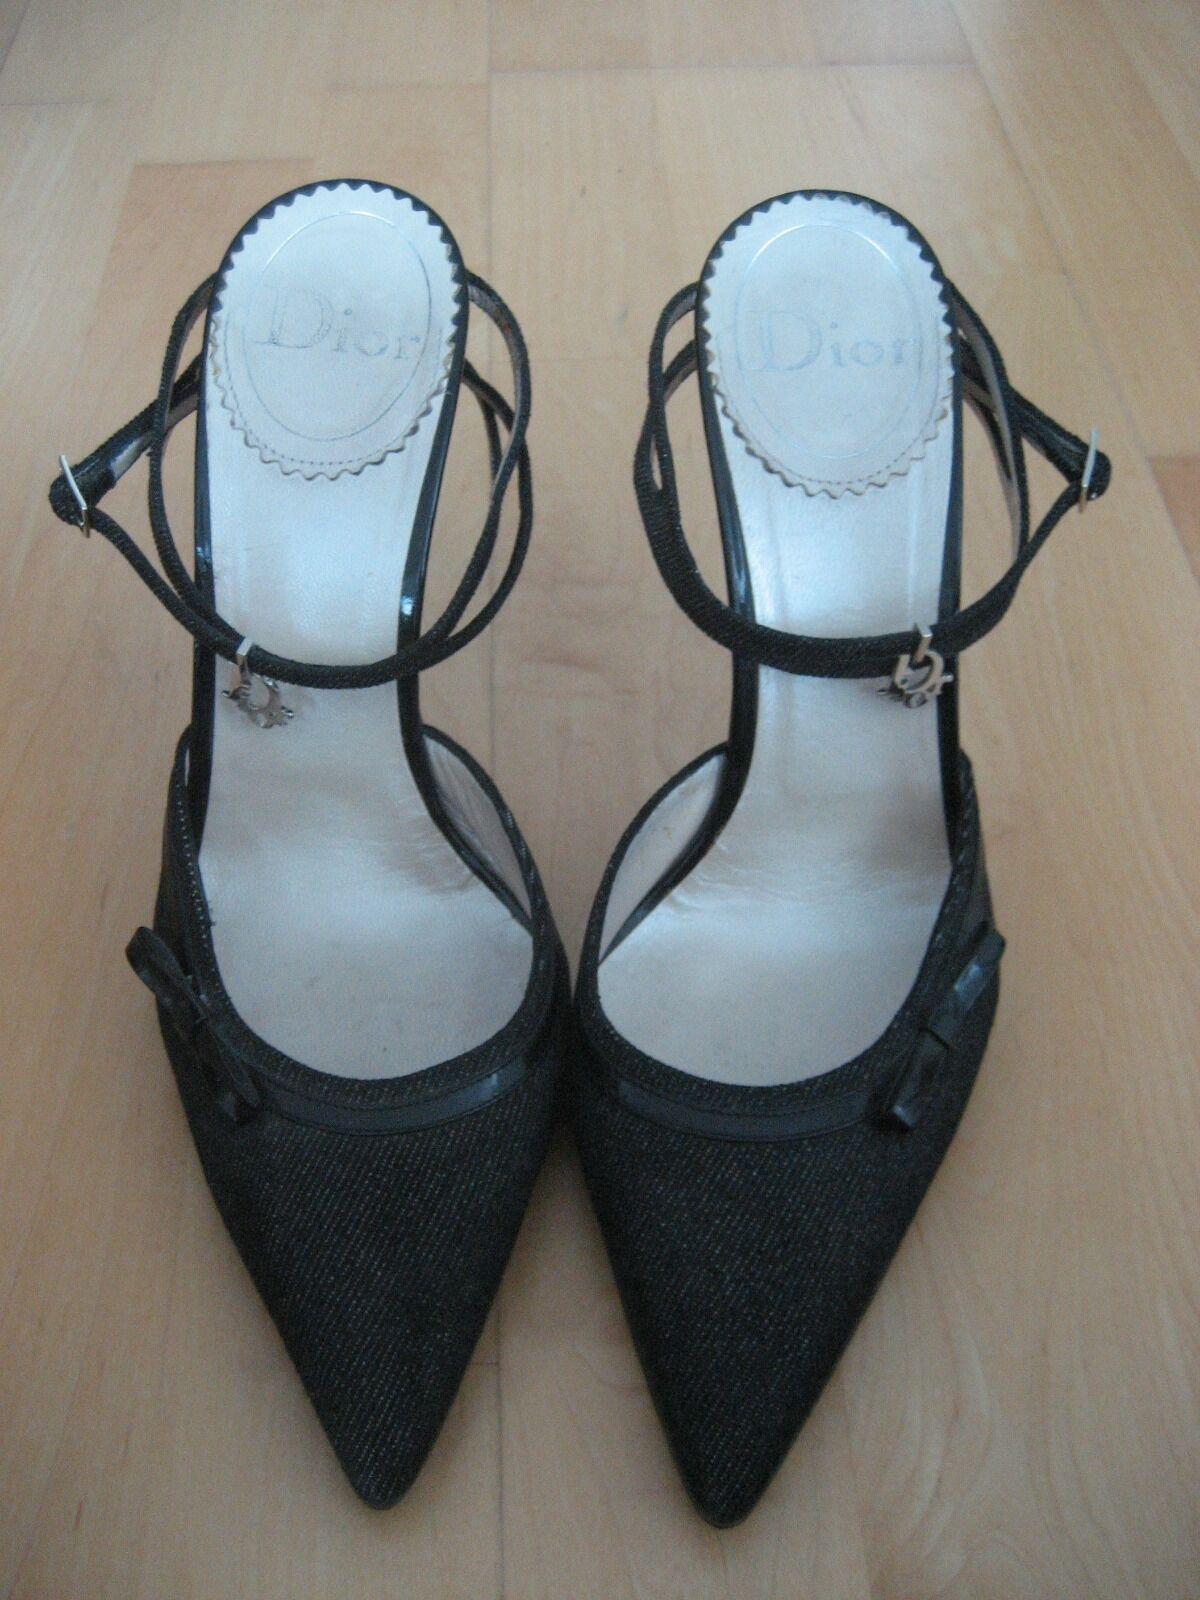 Christian Dior elegant grau stiletto heels, Größe EU 38.5   UK 5.5